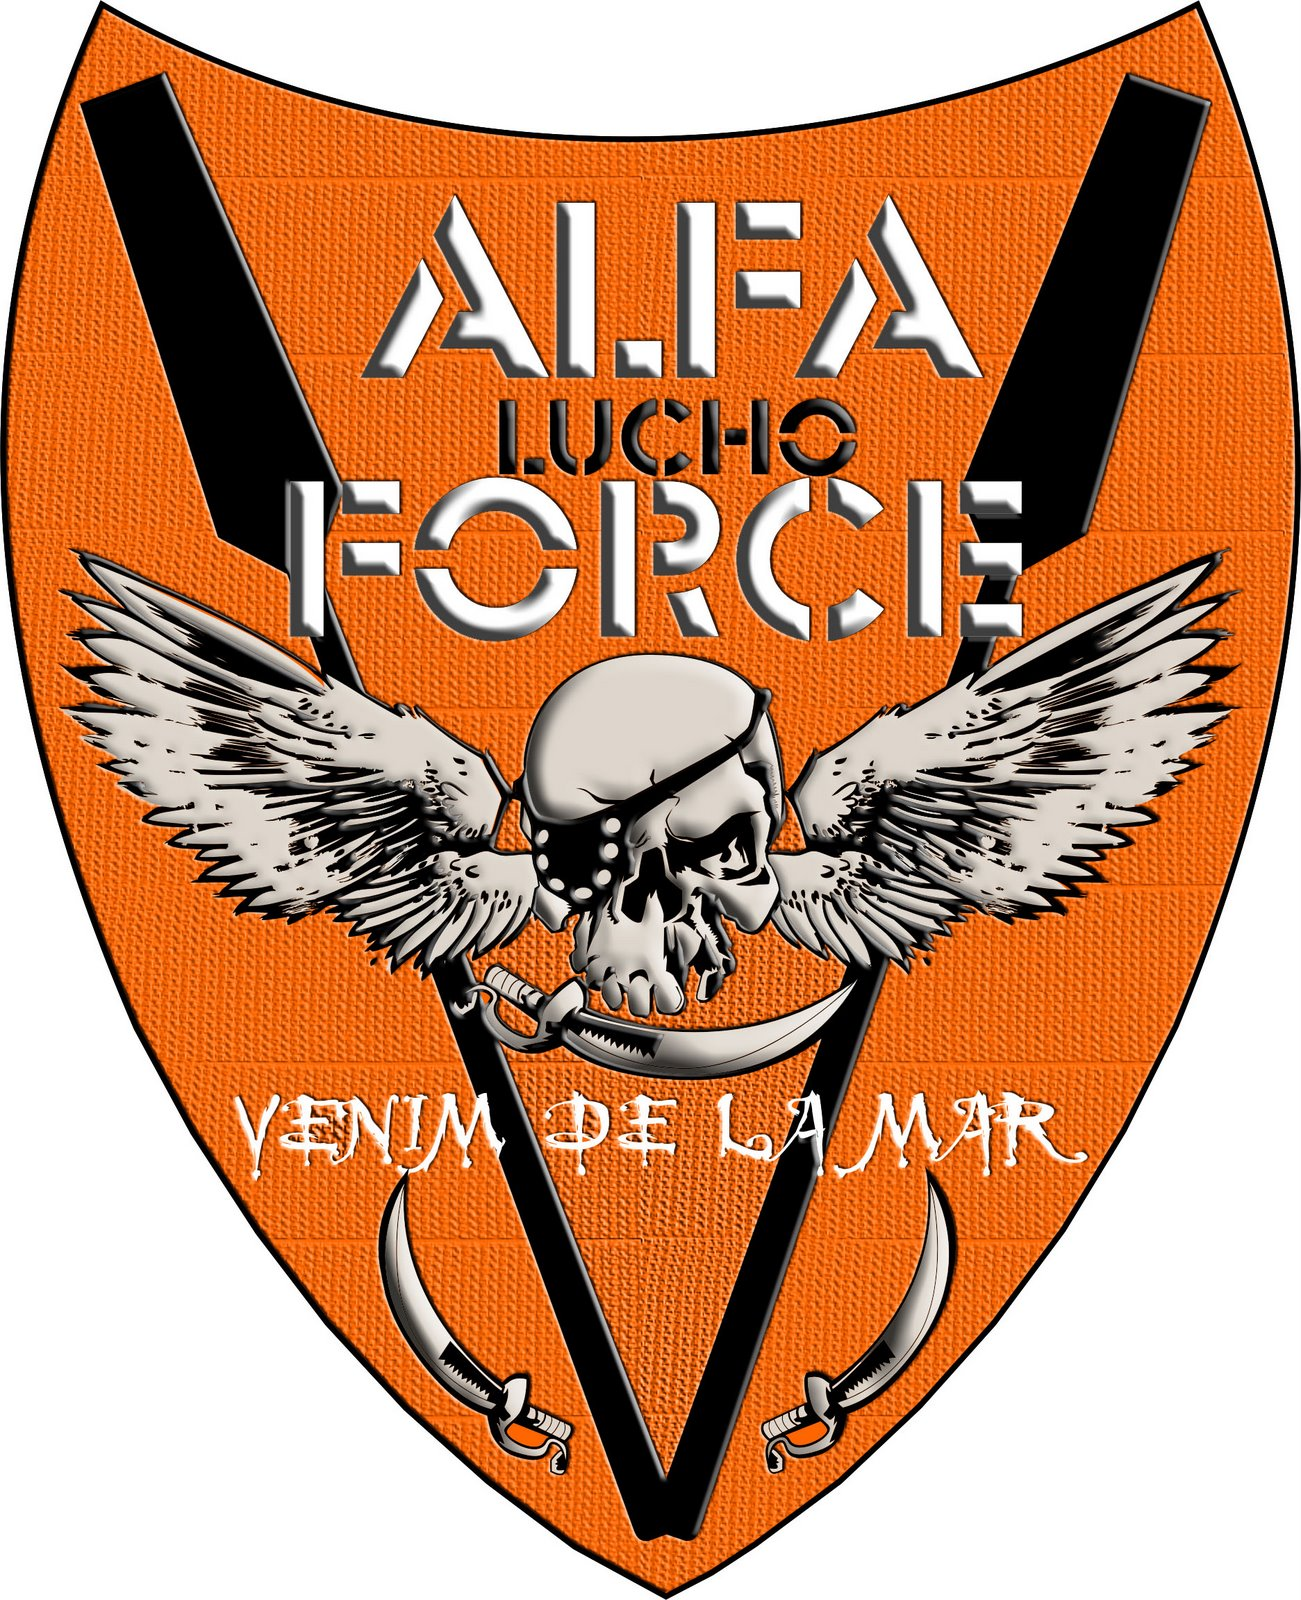 [ALFA+LUCHO+FORCE+copia.jpg]